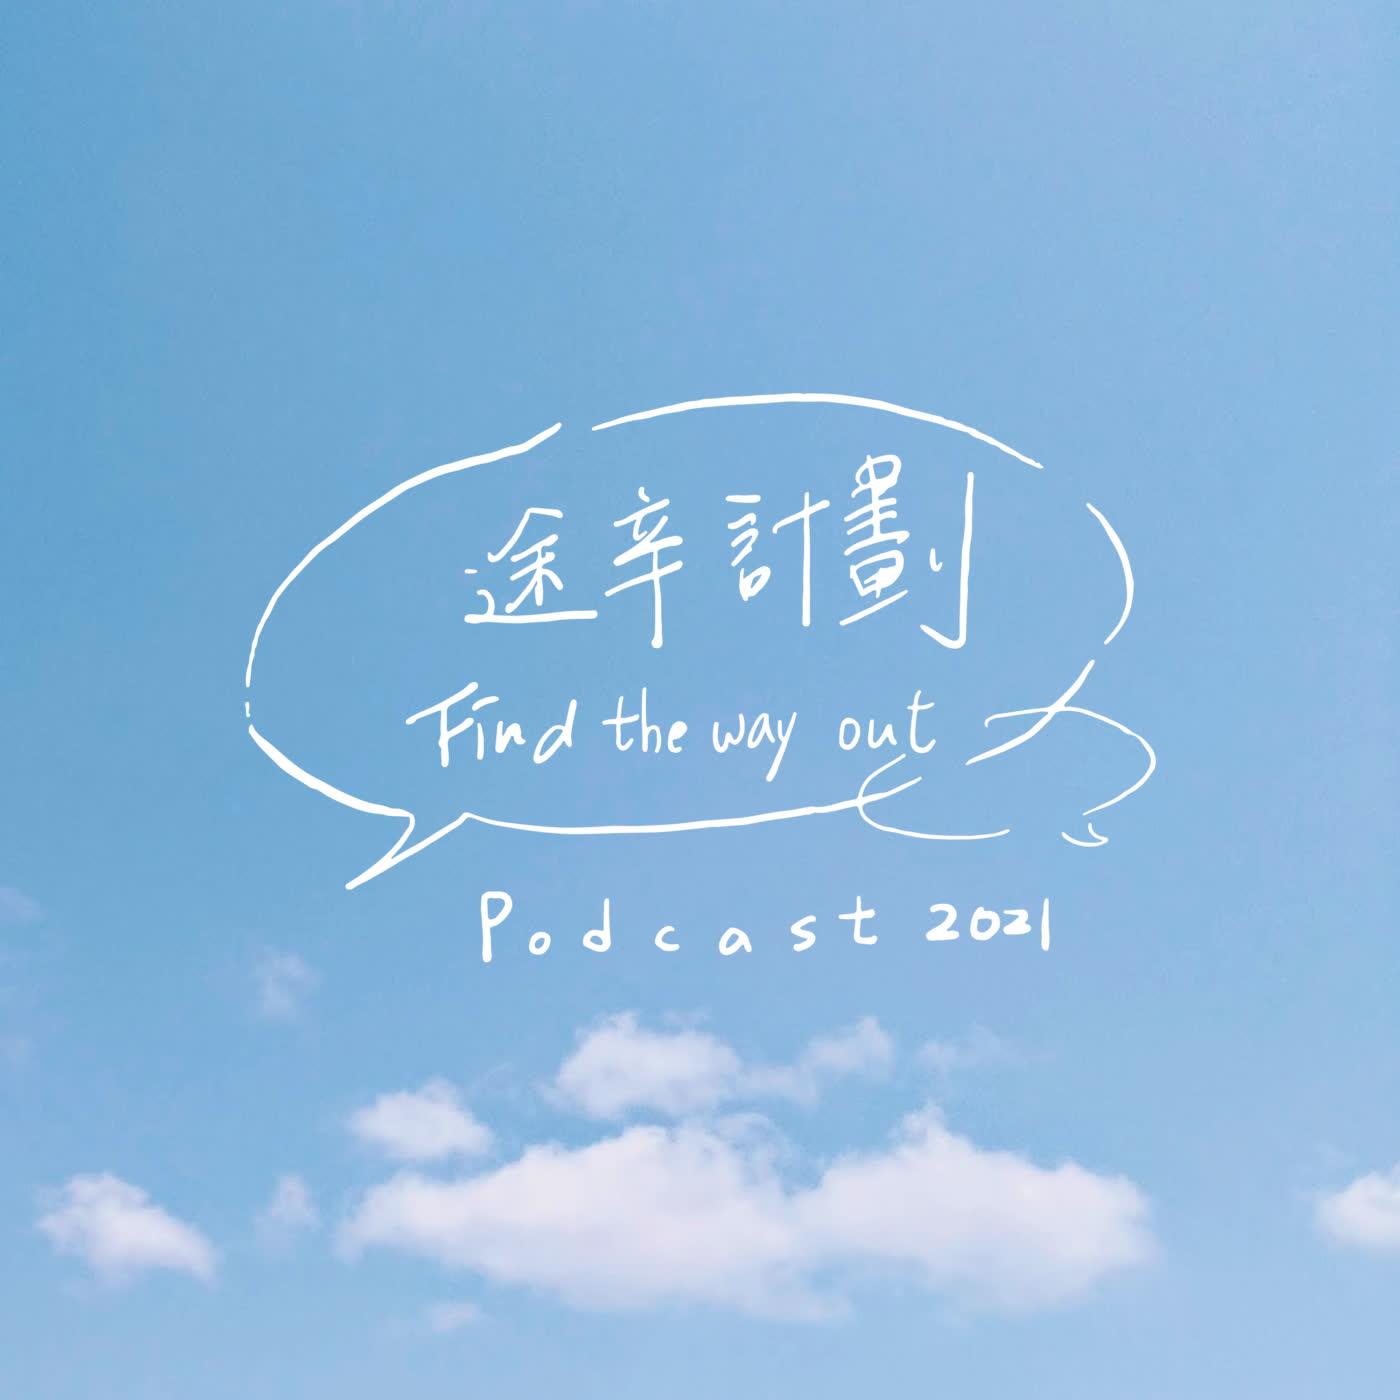 途辛計劃 Found the way out!